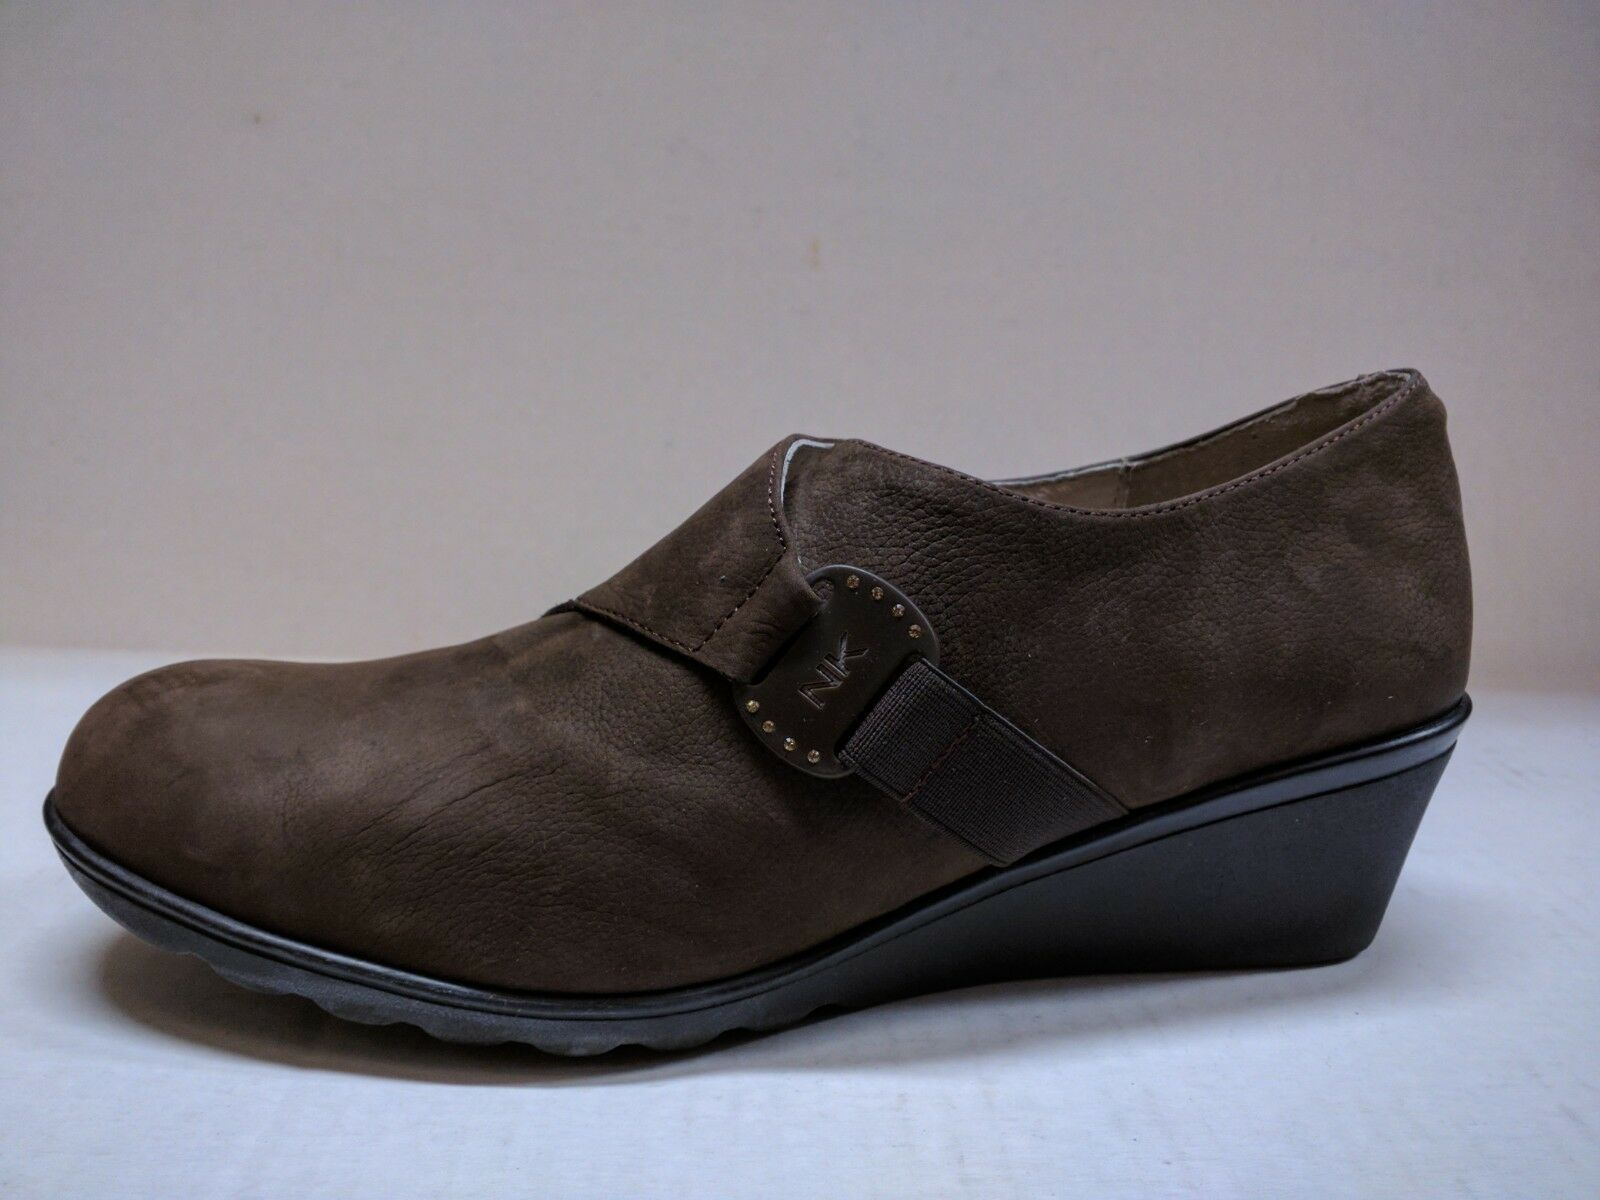 ENEKA donna WEDGE SLIDE scarpe VIENA  33567 MADE IN SPAIN ( 185) NOW ON SALE